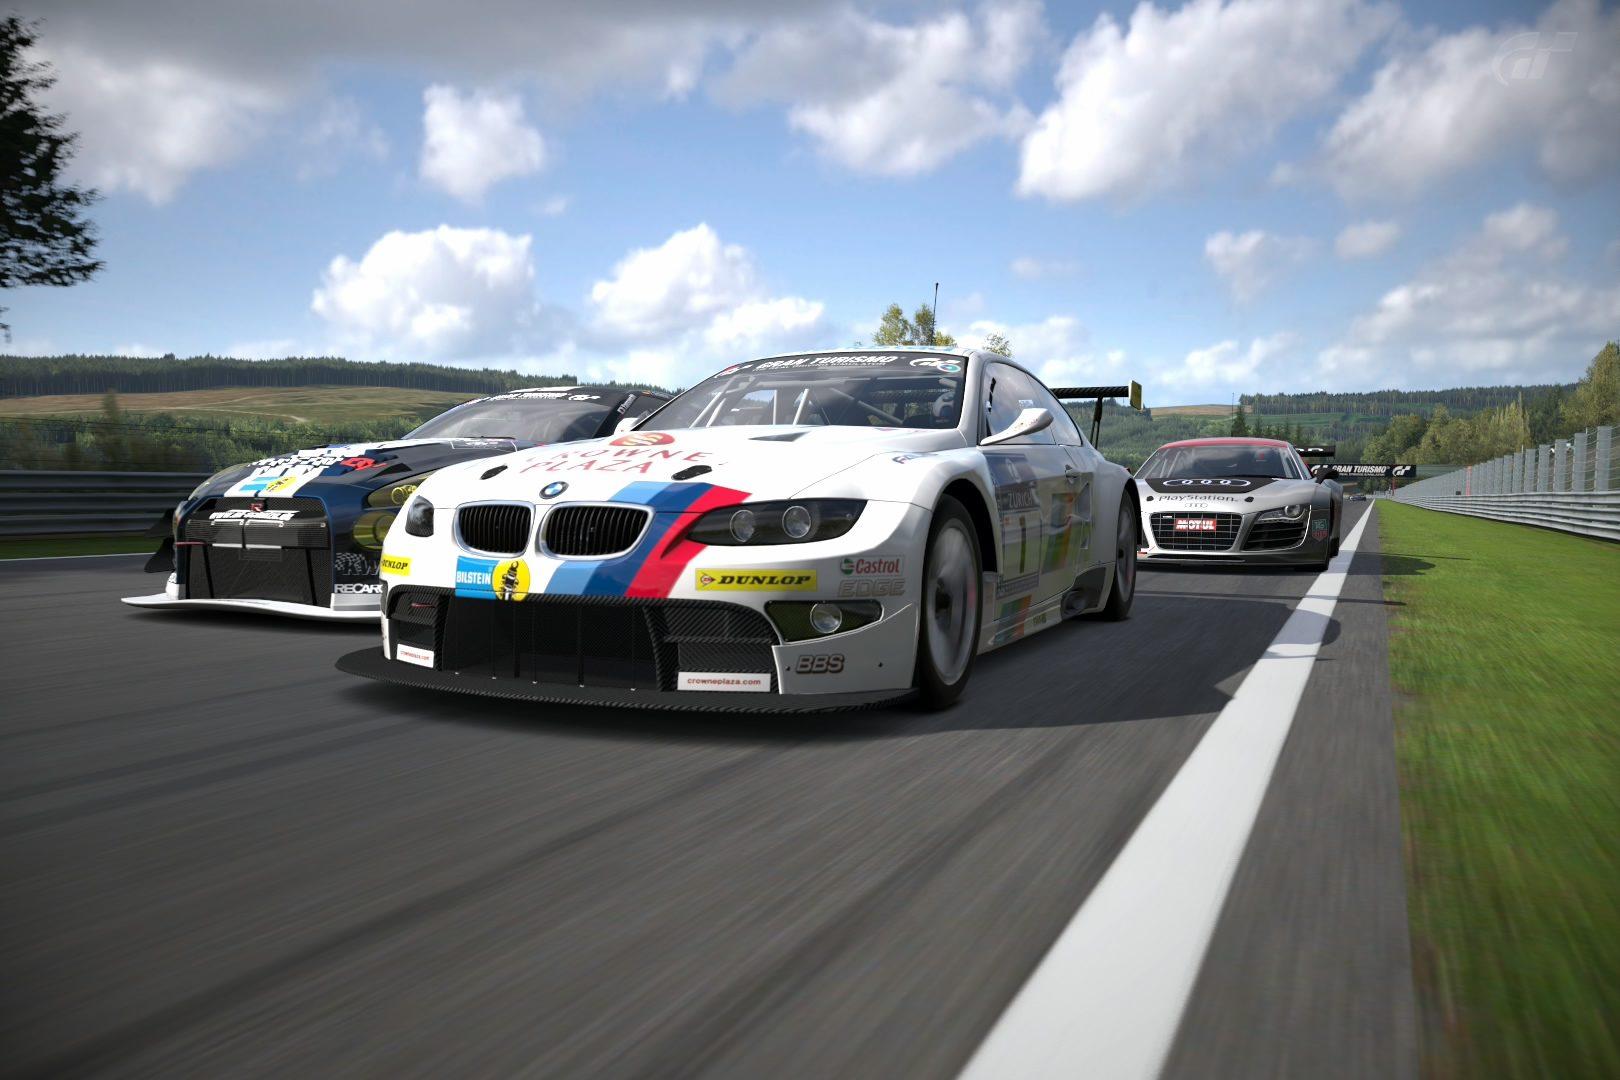 Circuit de Spa-Francorchamps_1.jpg